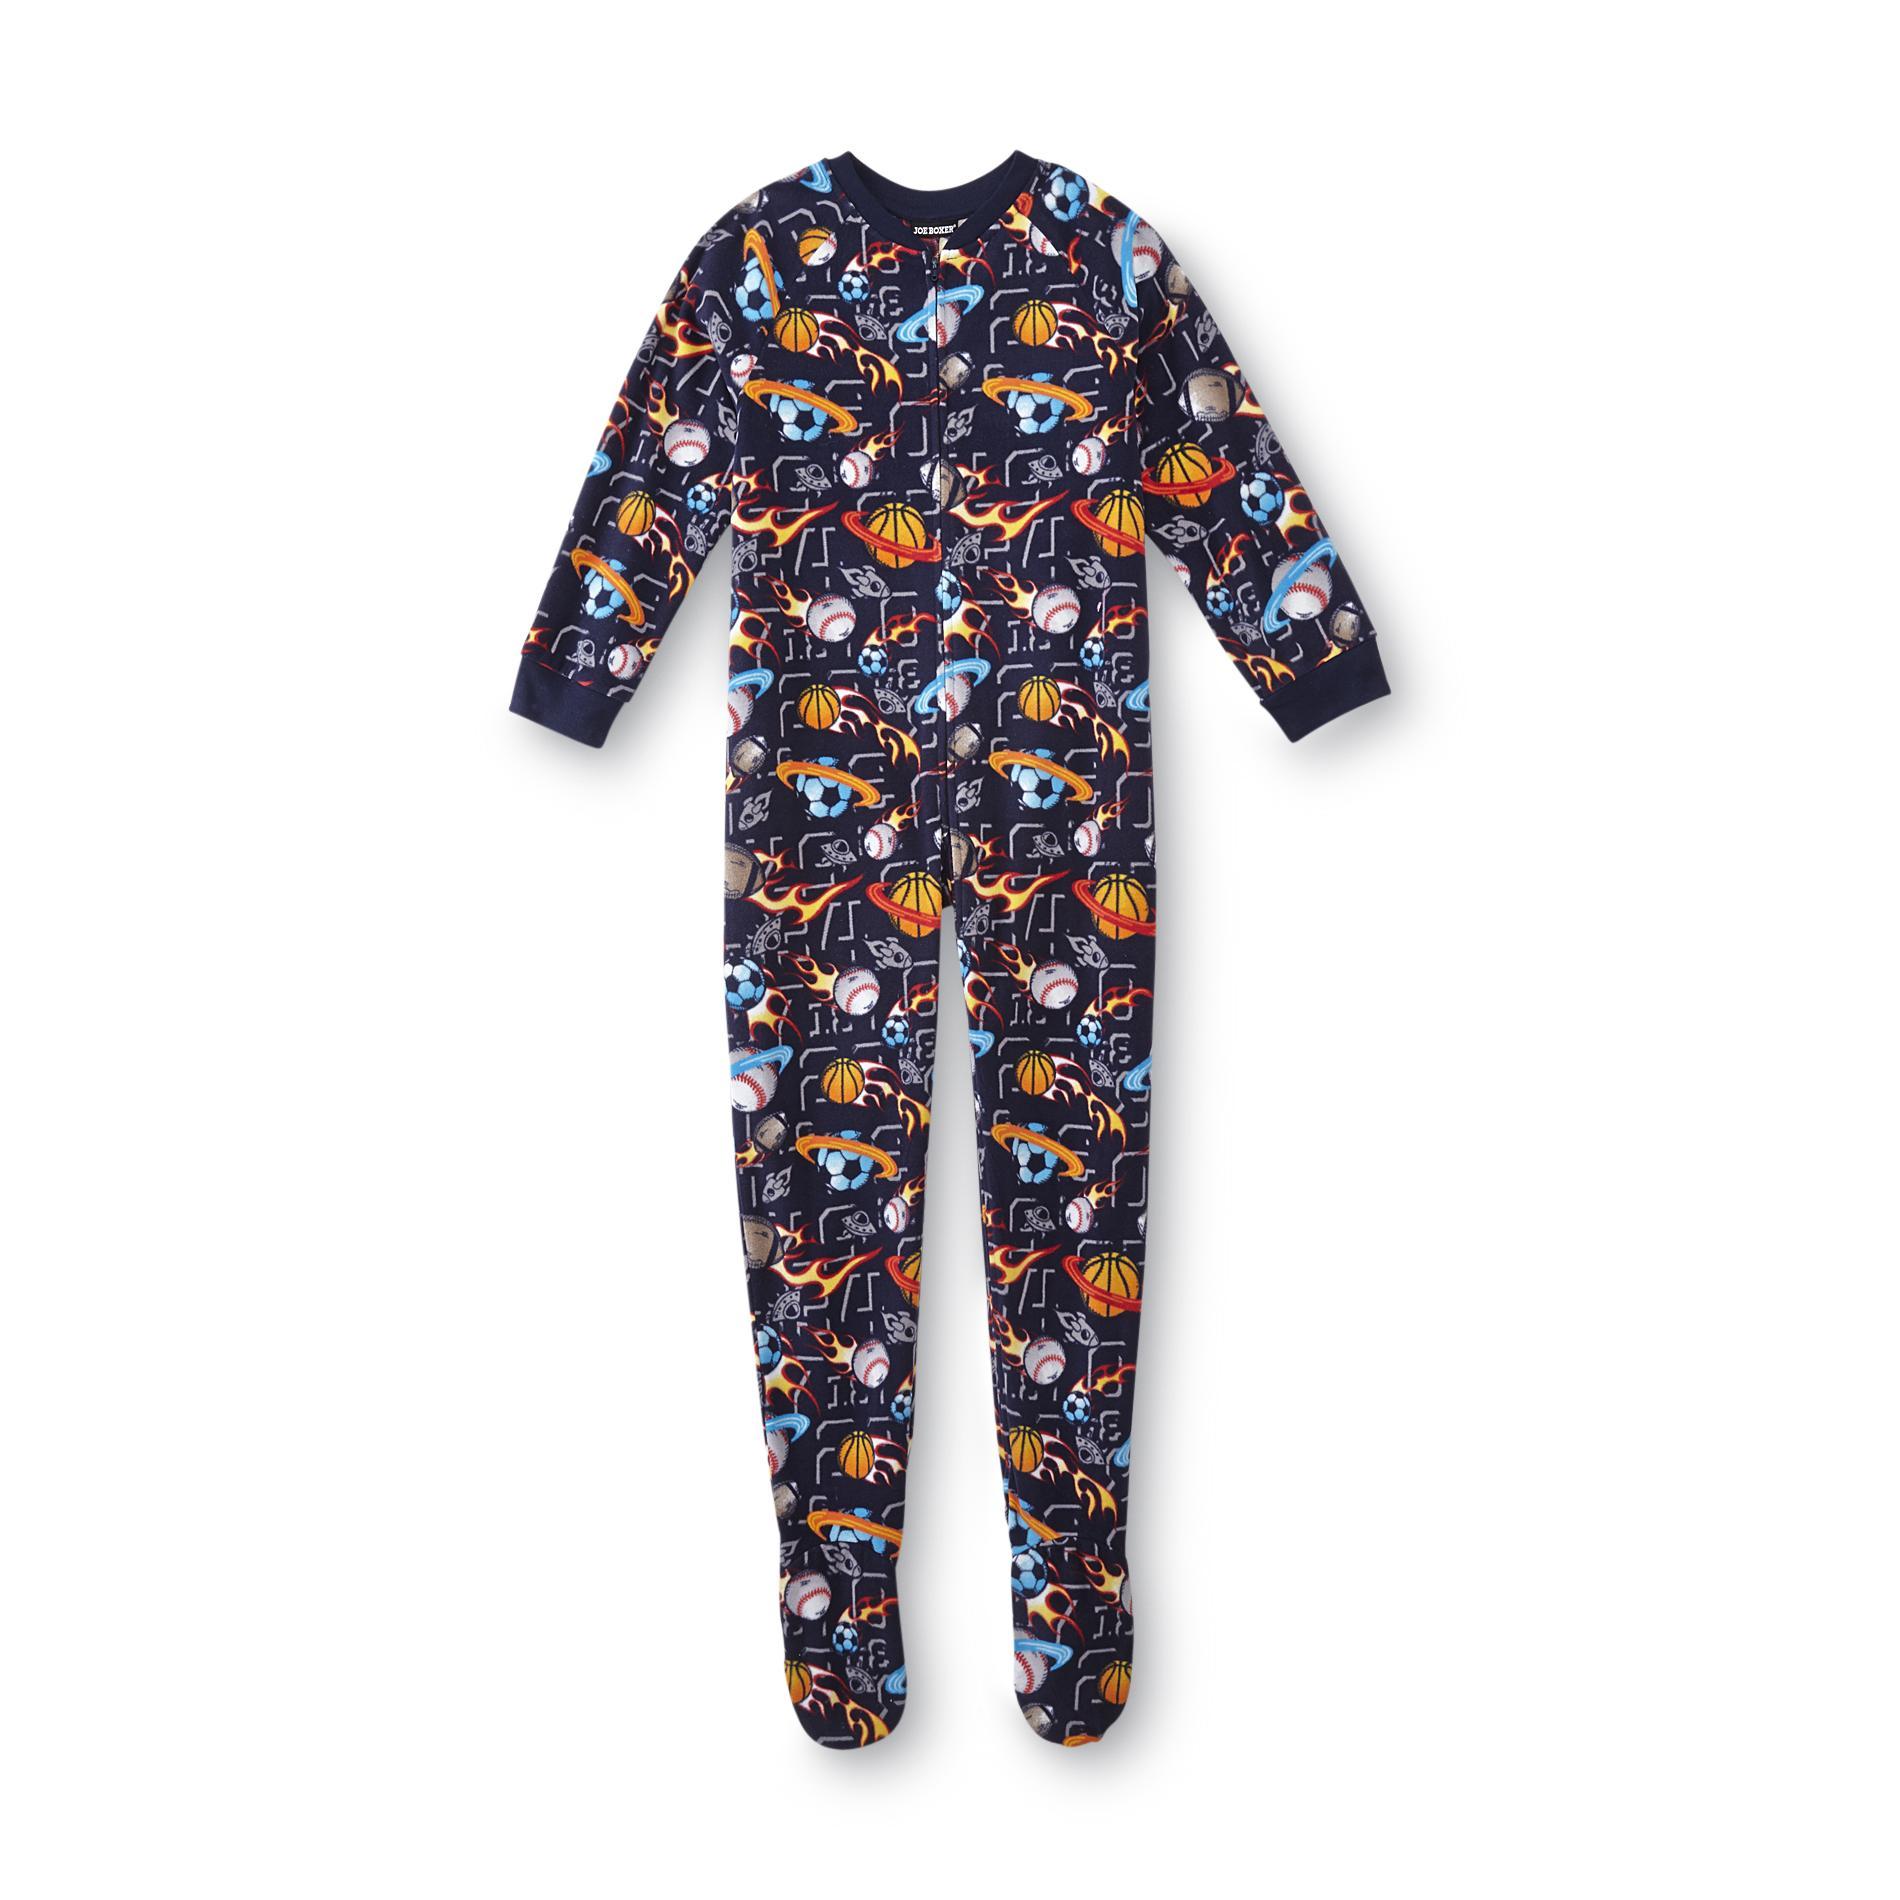 Joe Boxer Boy' Footed Pajamas - Space Sports Clothing Boys'